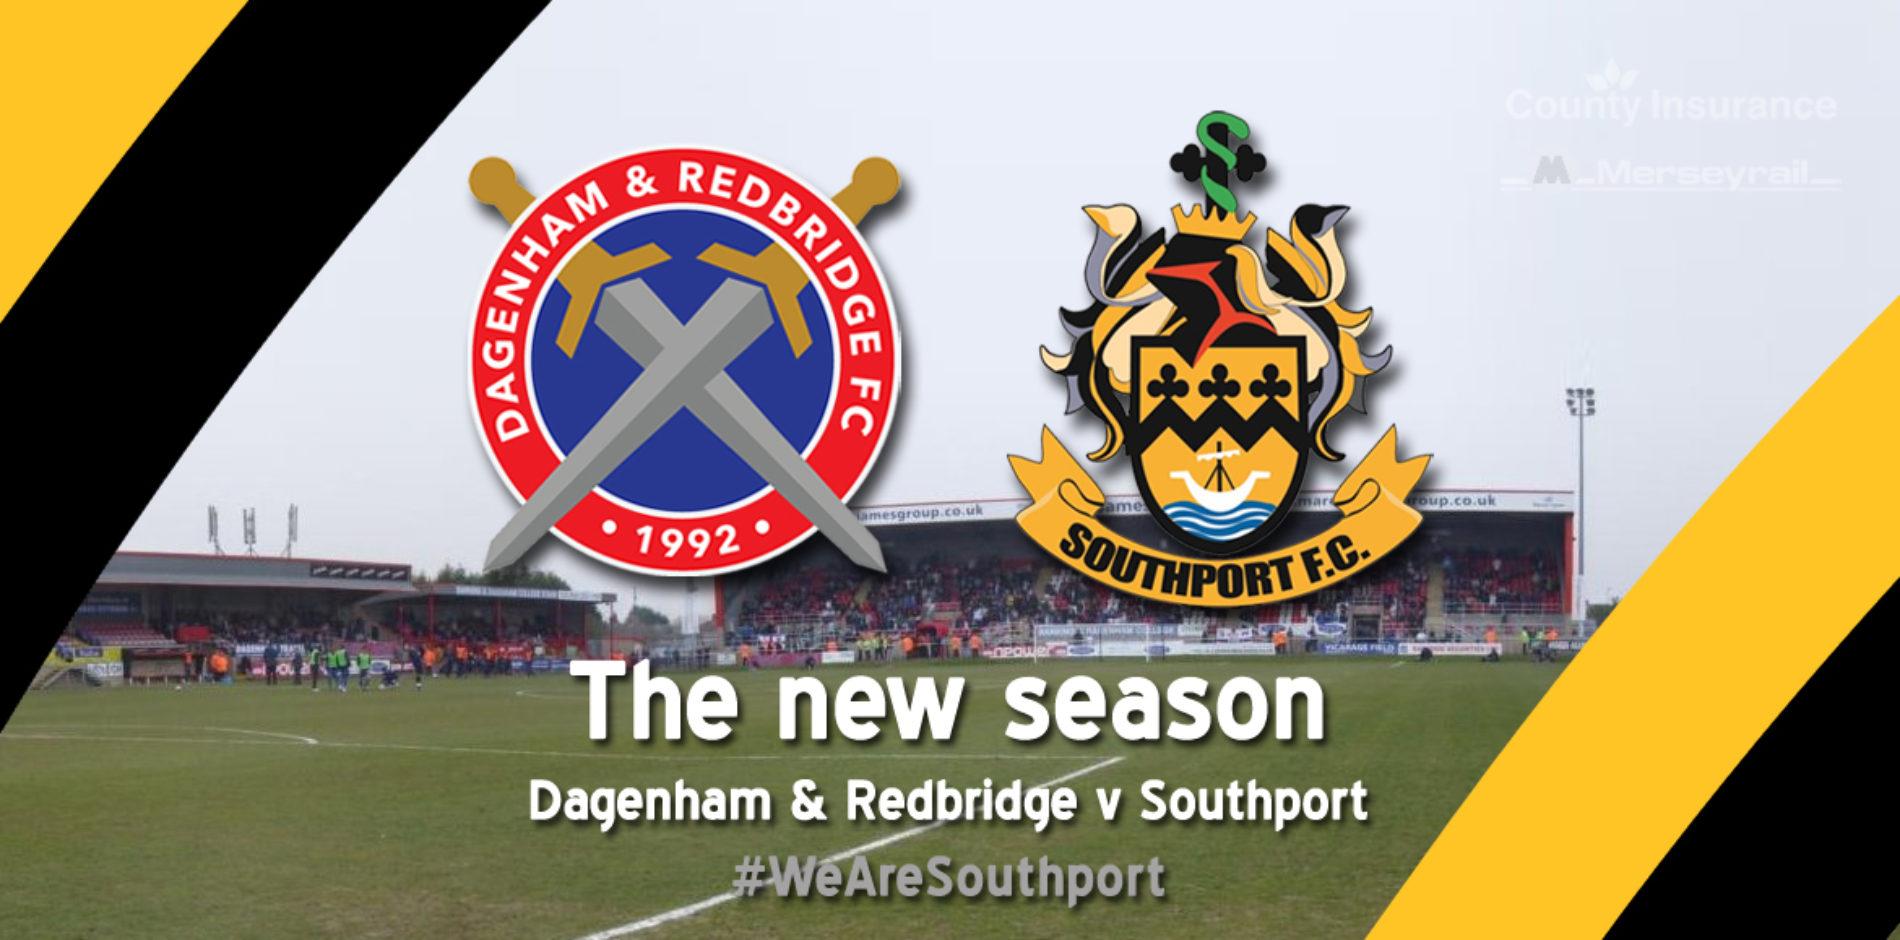 MATCH REPORT | Dagenham & Redbridge 3 – 0 Southport